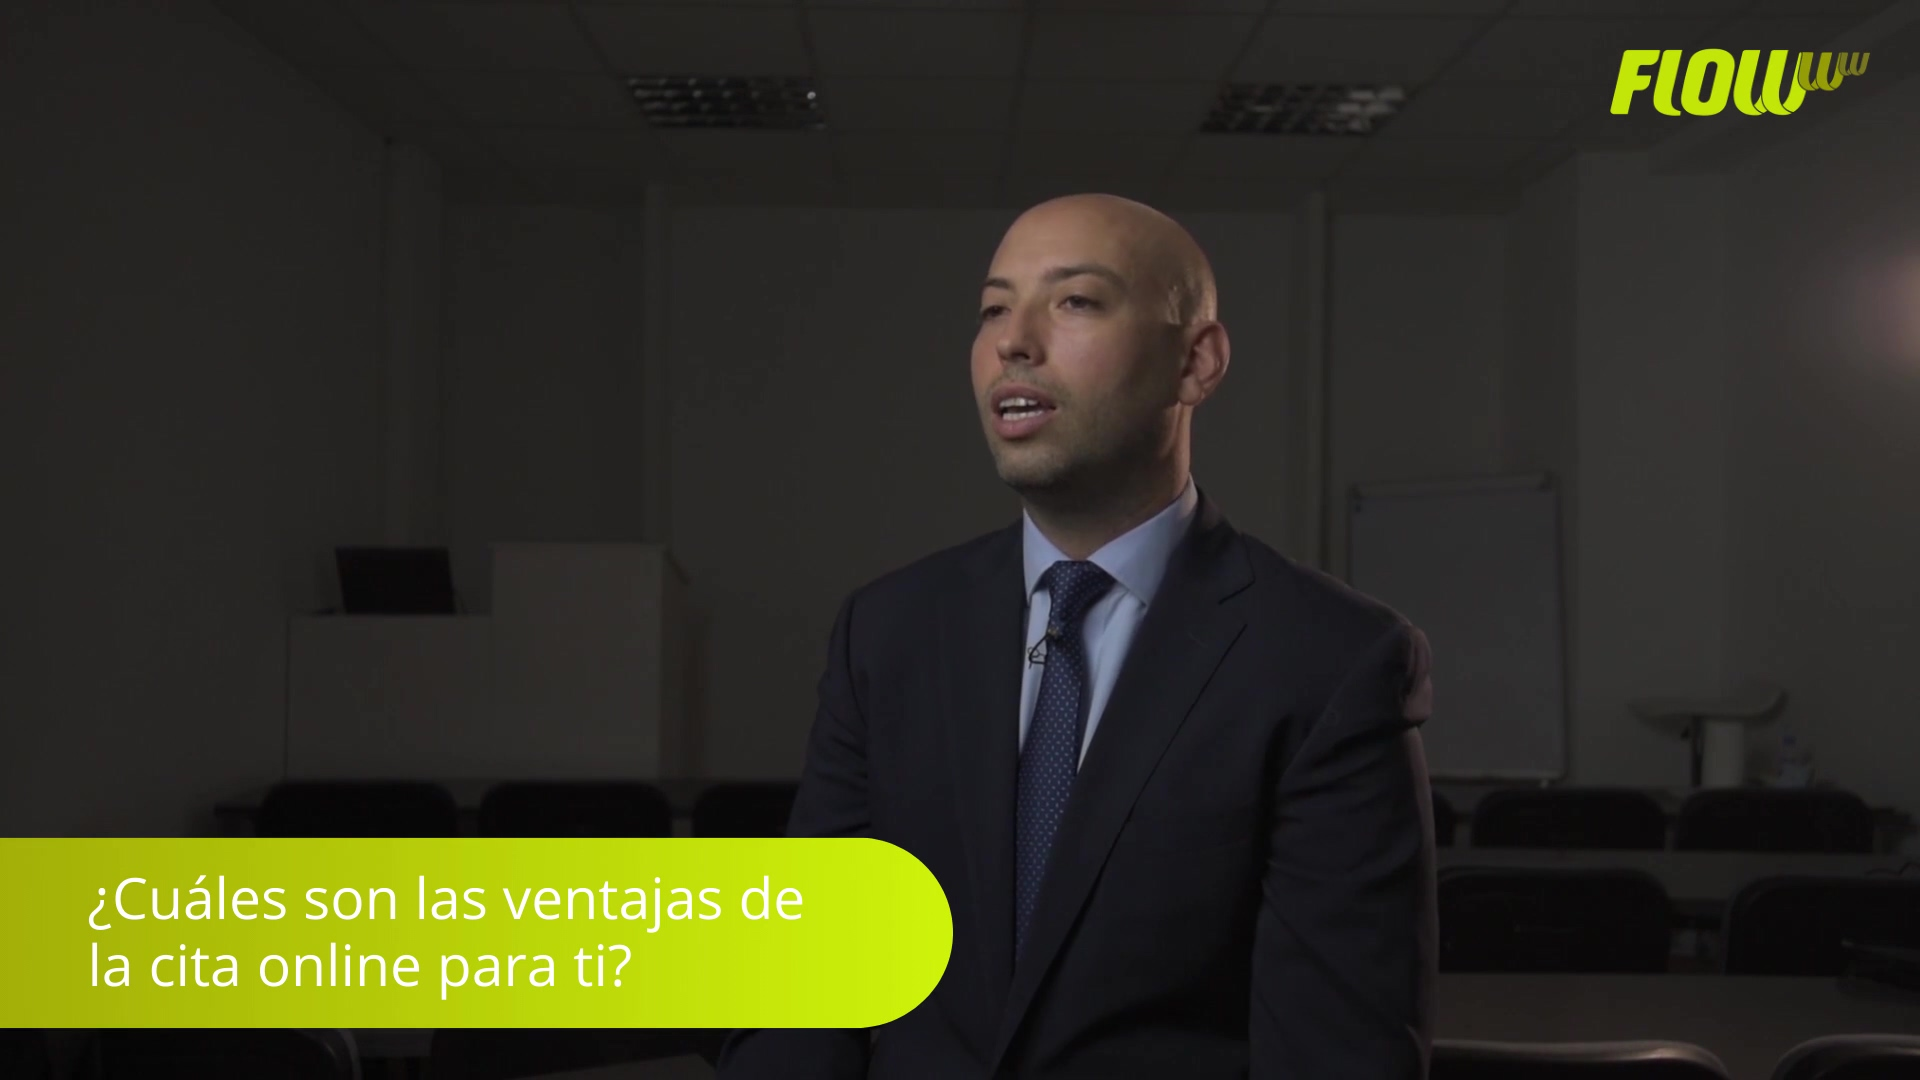 Dermasana - Ventajas cita online para ti